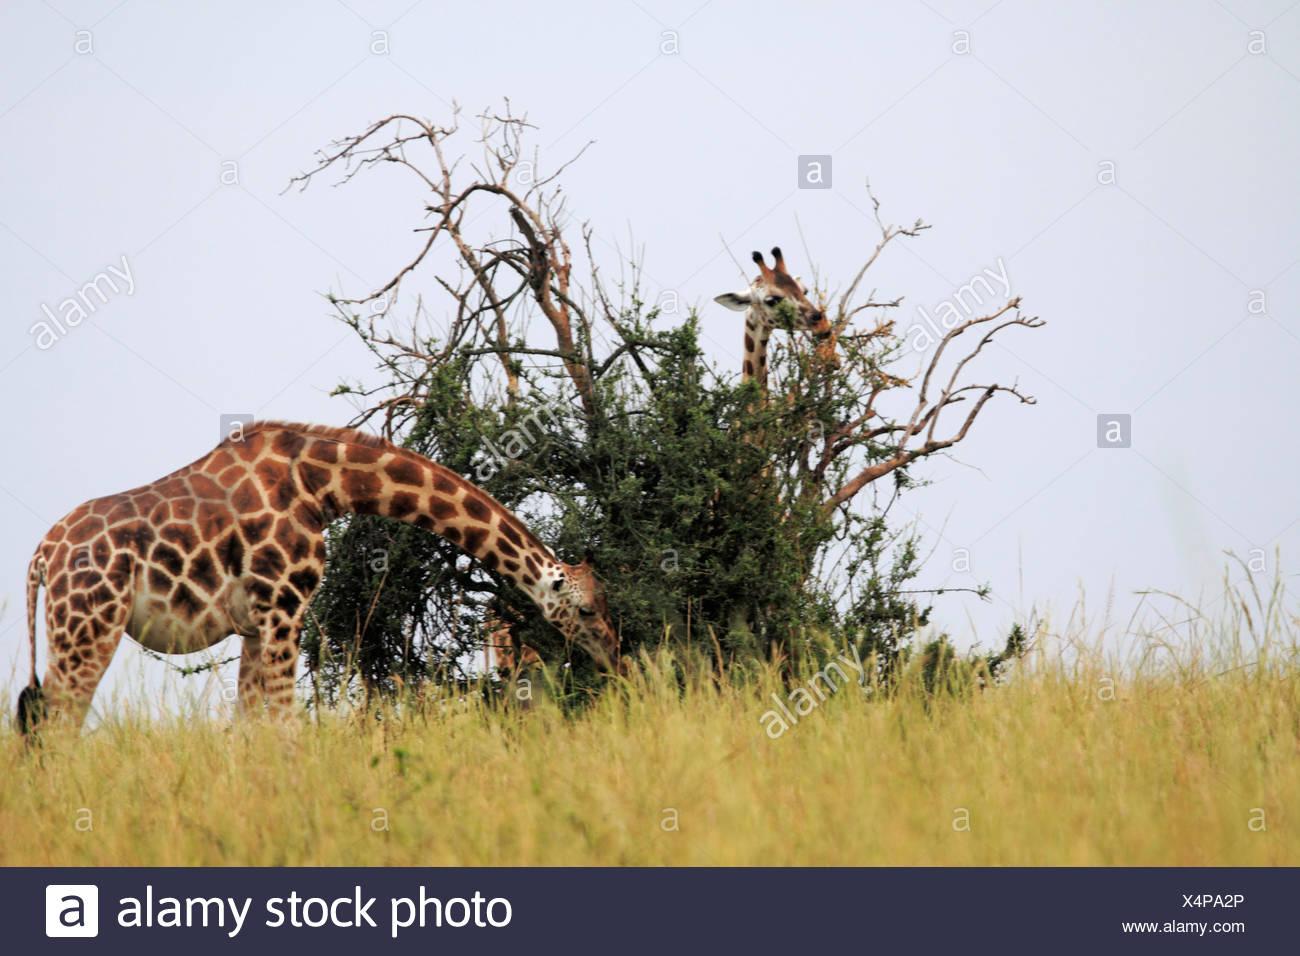 Rothschild's giraffe, Rothschild giraffe, Baringo Giraffe, Ugandan Giraffe (Giraffa camelopardalis rothschildi), eating, Uganda, Murchison Falls National Park - Stock Image